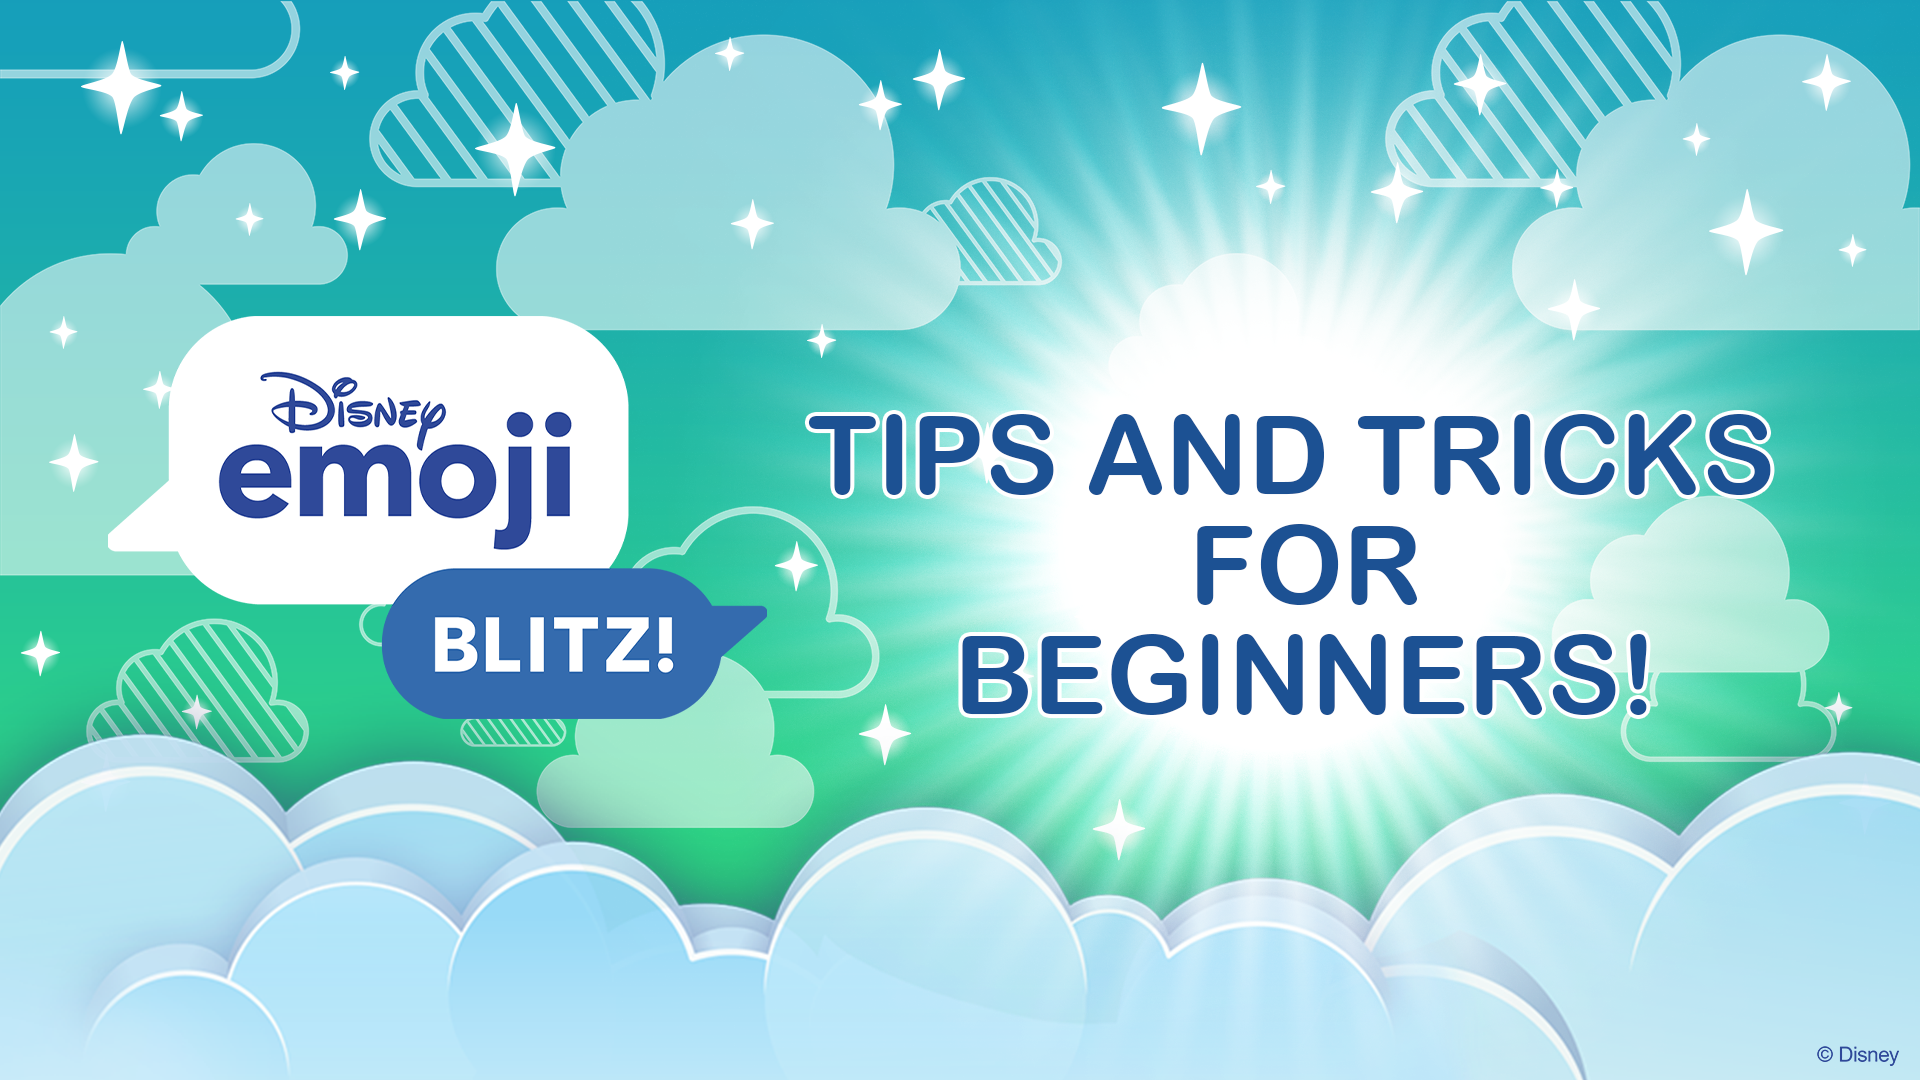 Tips for Beginners in Disney Emoji Blitz